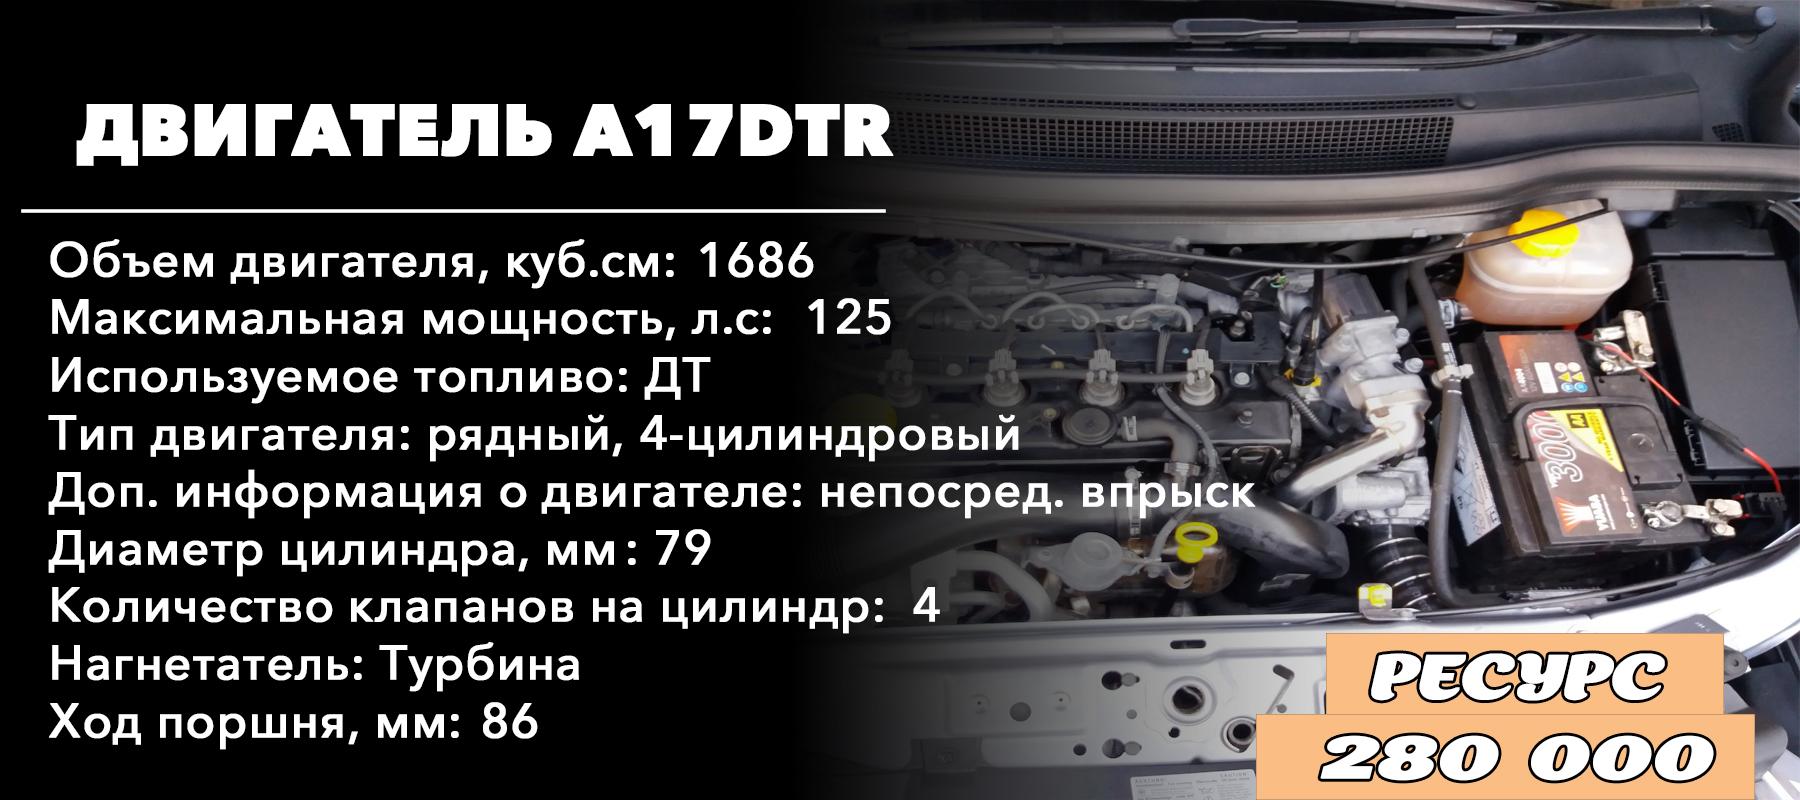 Ресурс двигателя 1.7 - A17DTR